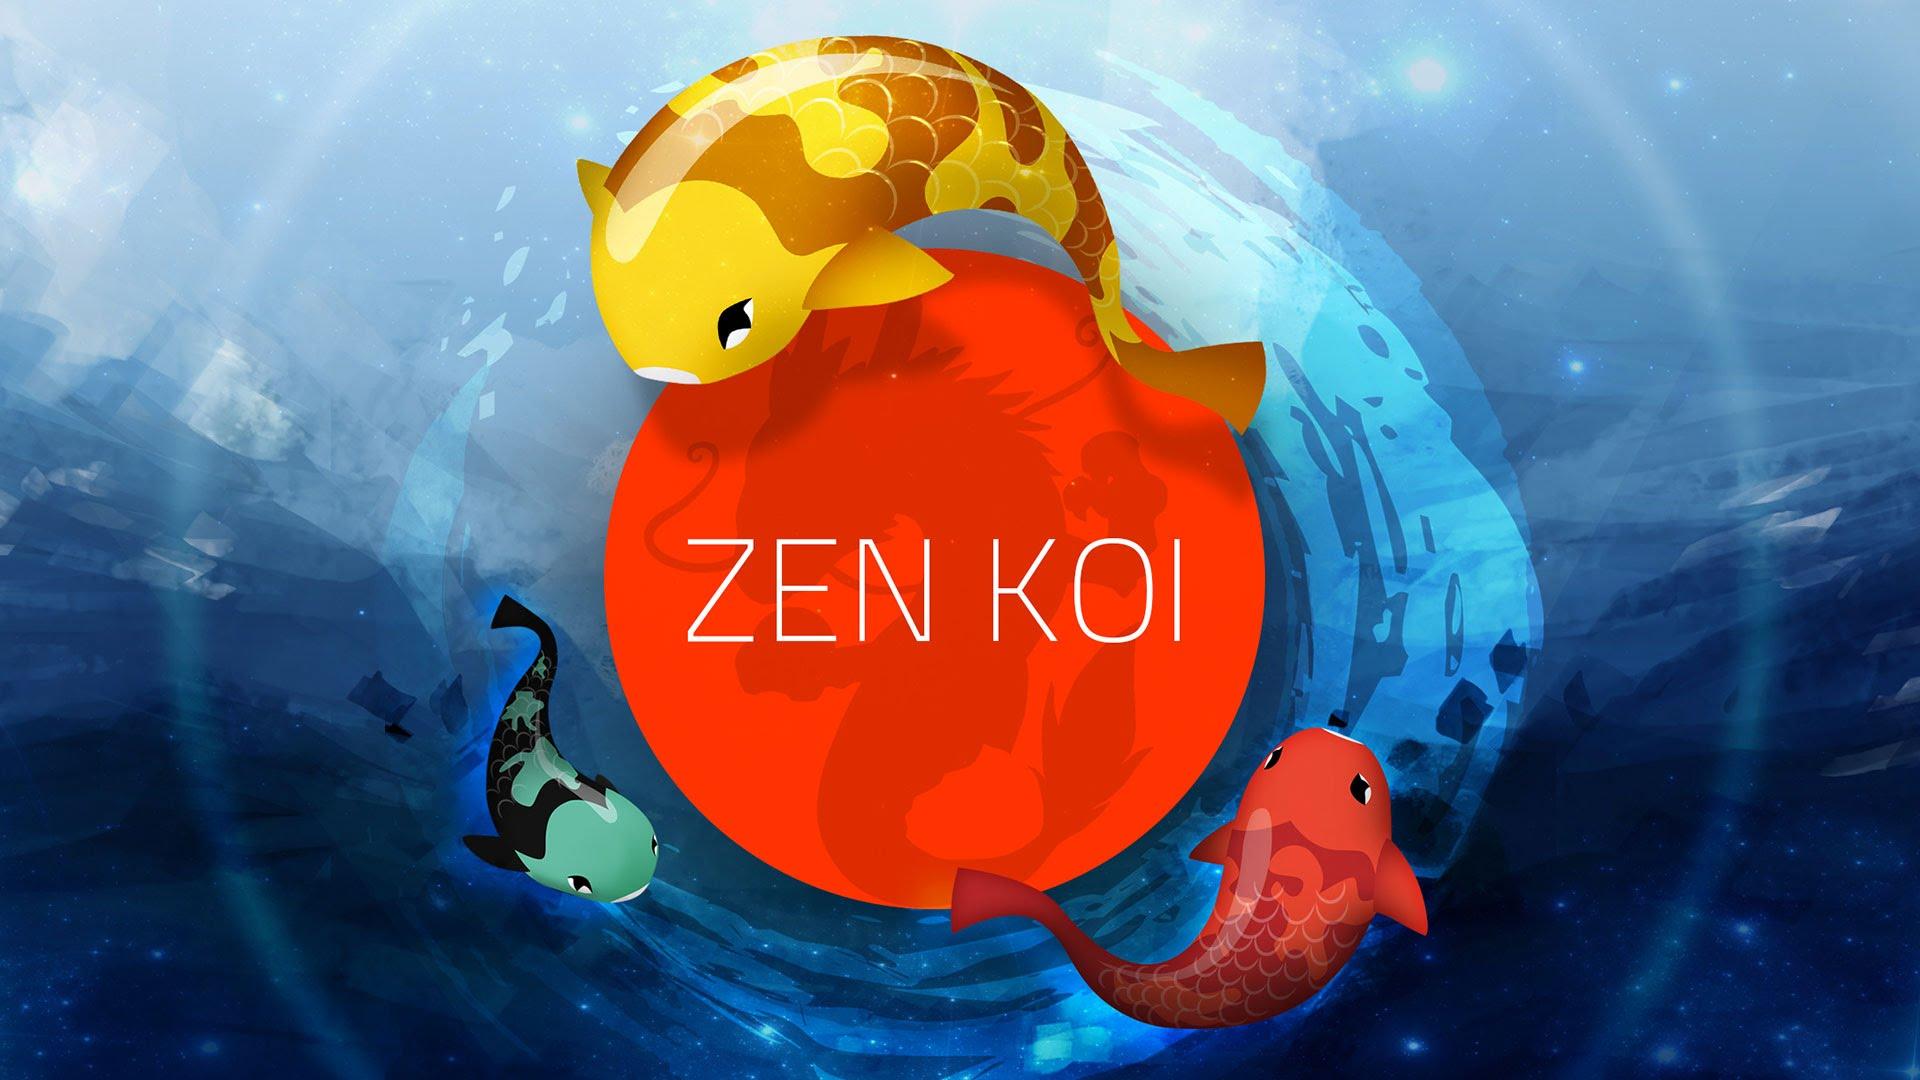 How to obtain rare koi in zen koi for Koi pond zen